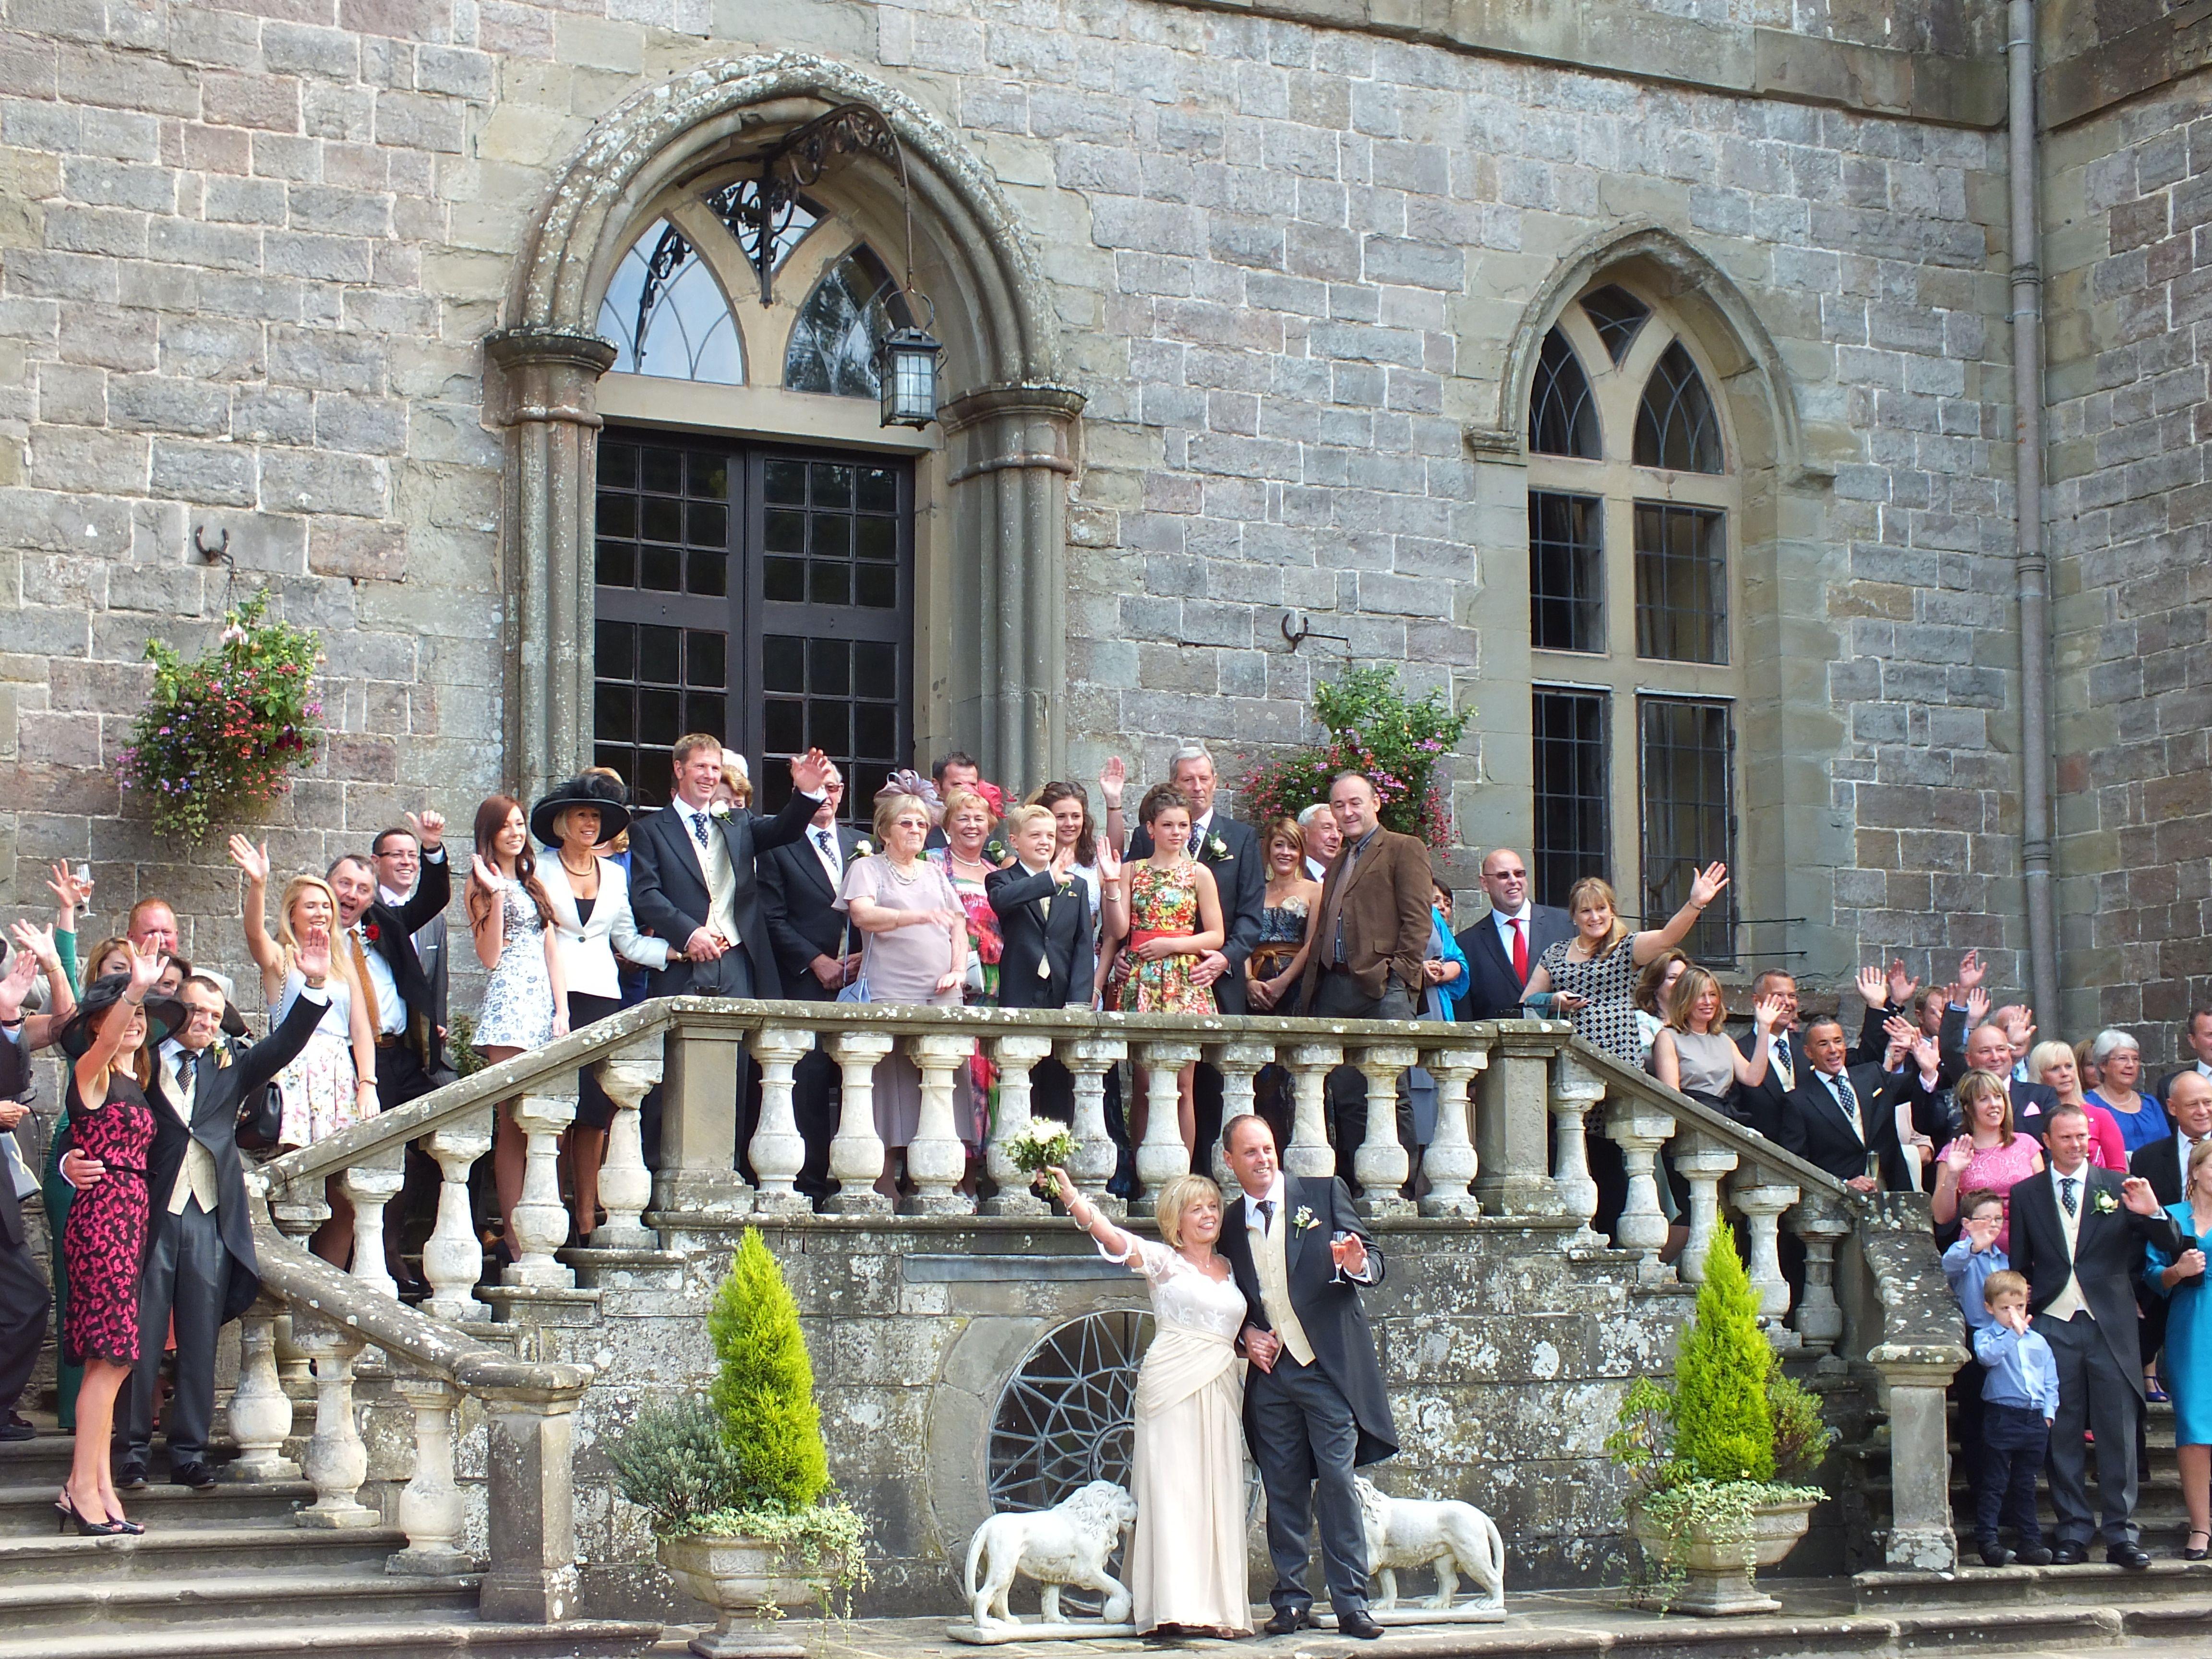 Clearwell Castle Wedding Venue Castle wedding venue